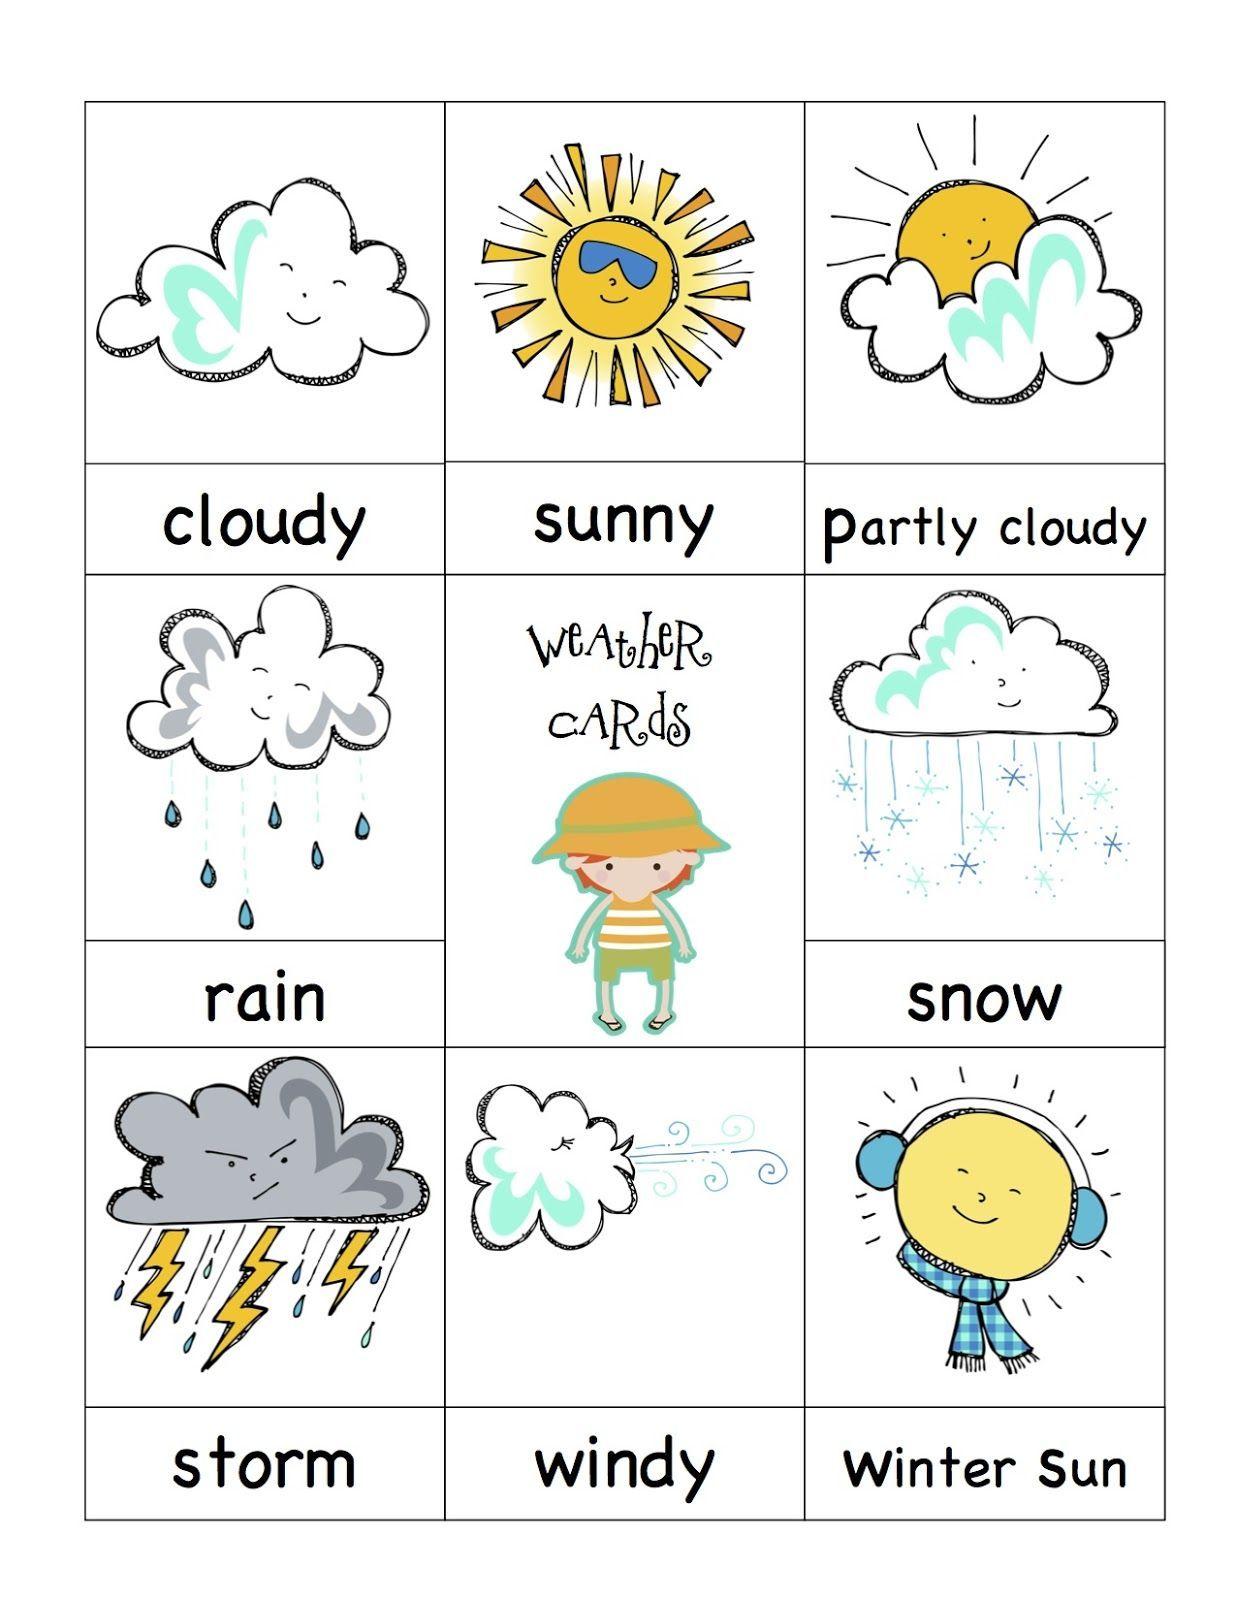 The Excellent Weather Cards Preschool Preschool Weather Preschool Pertaining To Kids Weather Repor Preschool Weather Preschool Weather Chart Weather Cards [ 1600 x 1236 Pixel ]